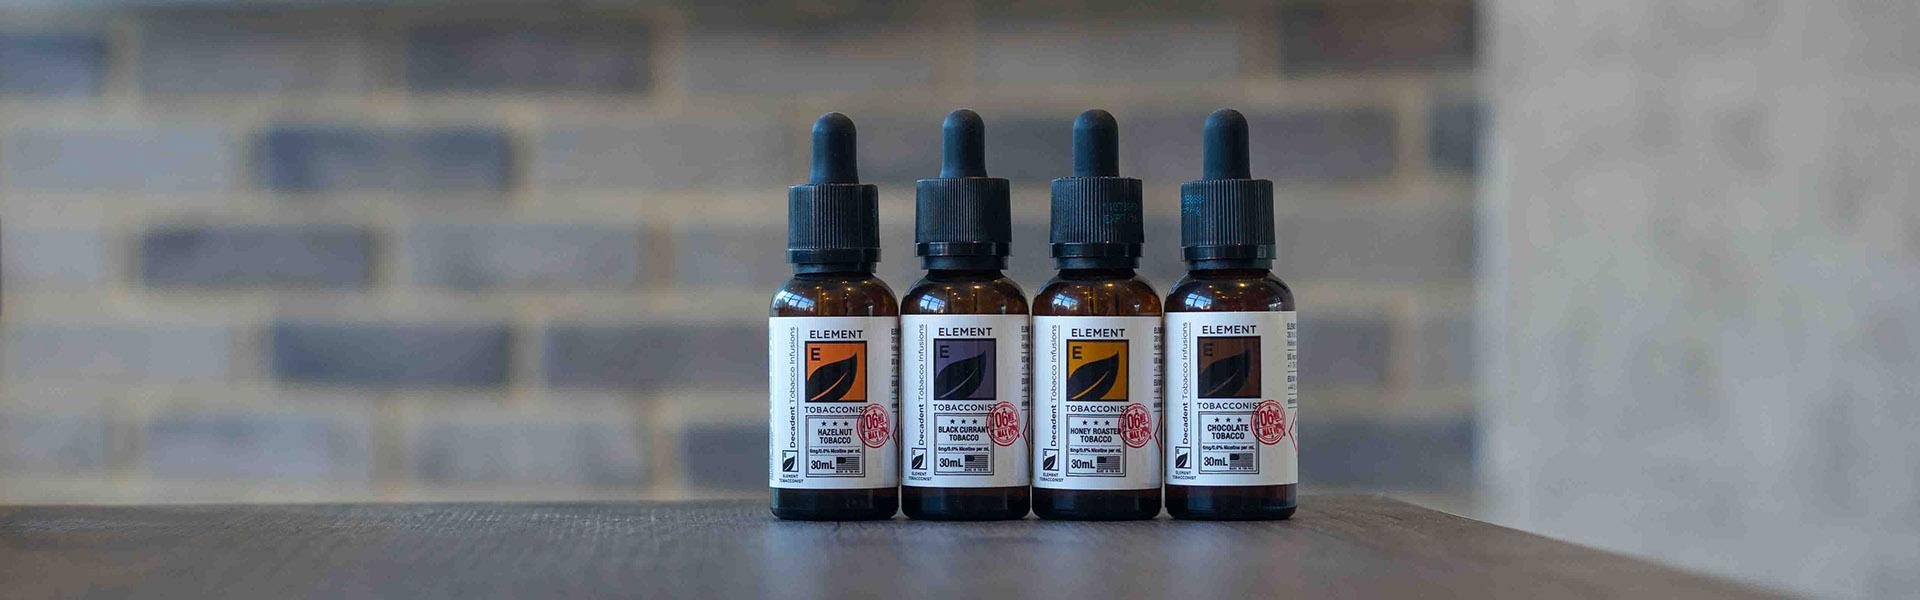 Elements Tobacconist